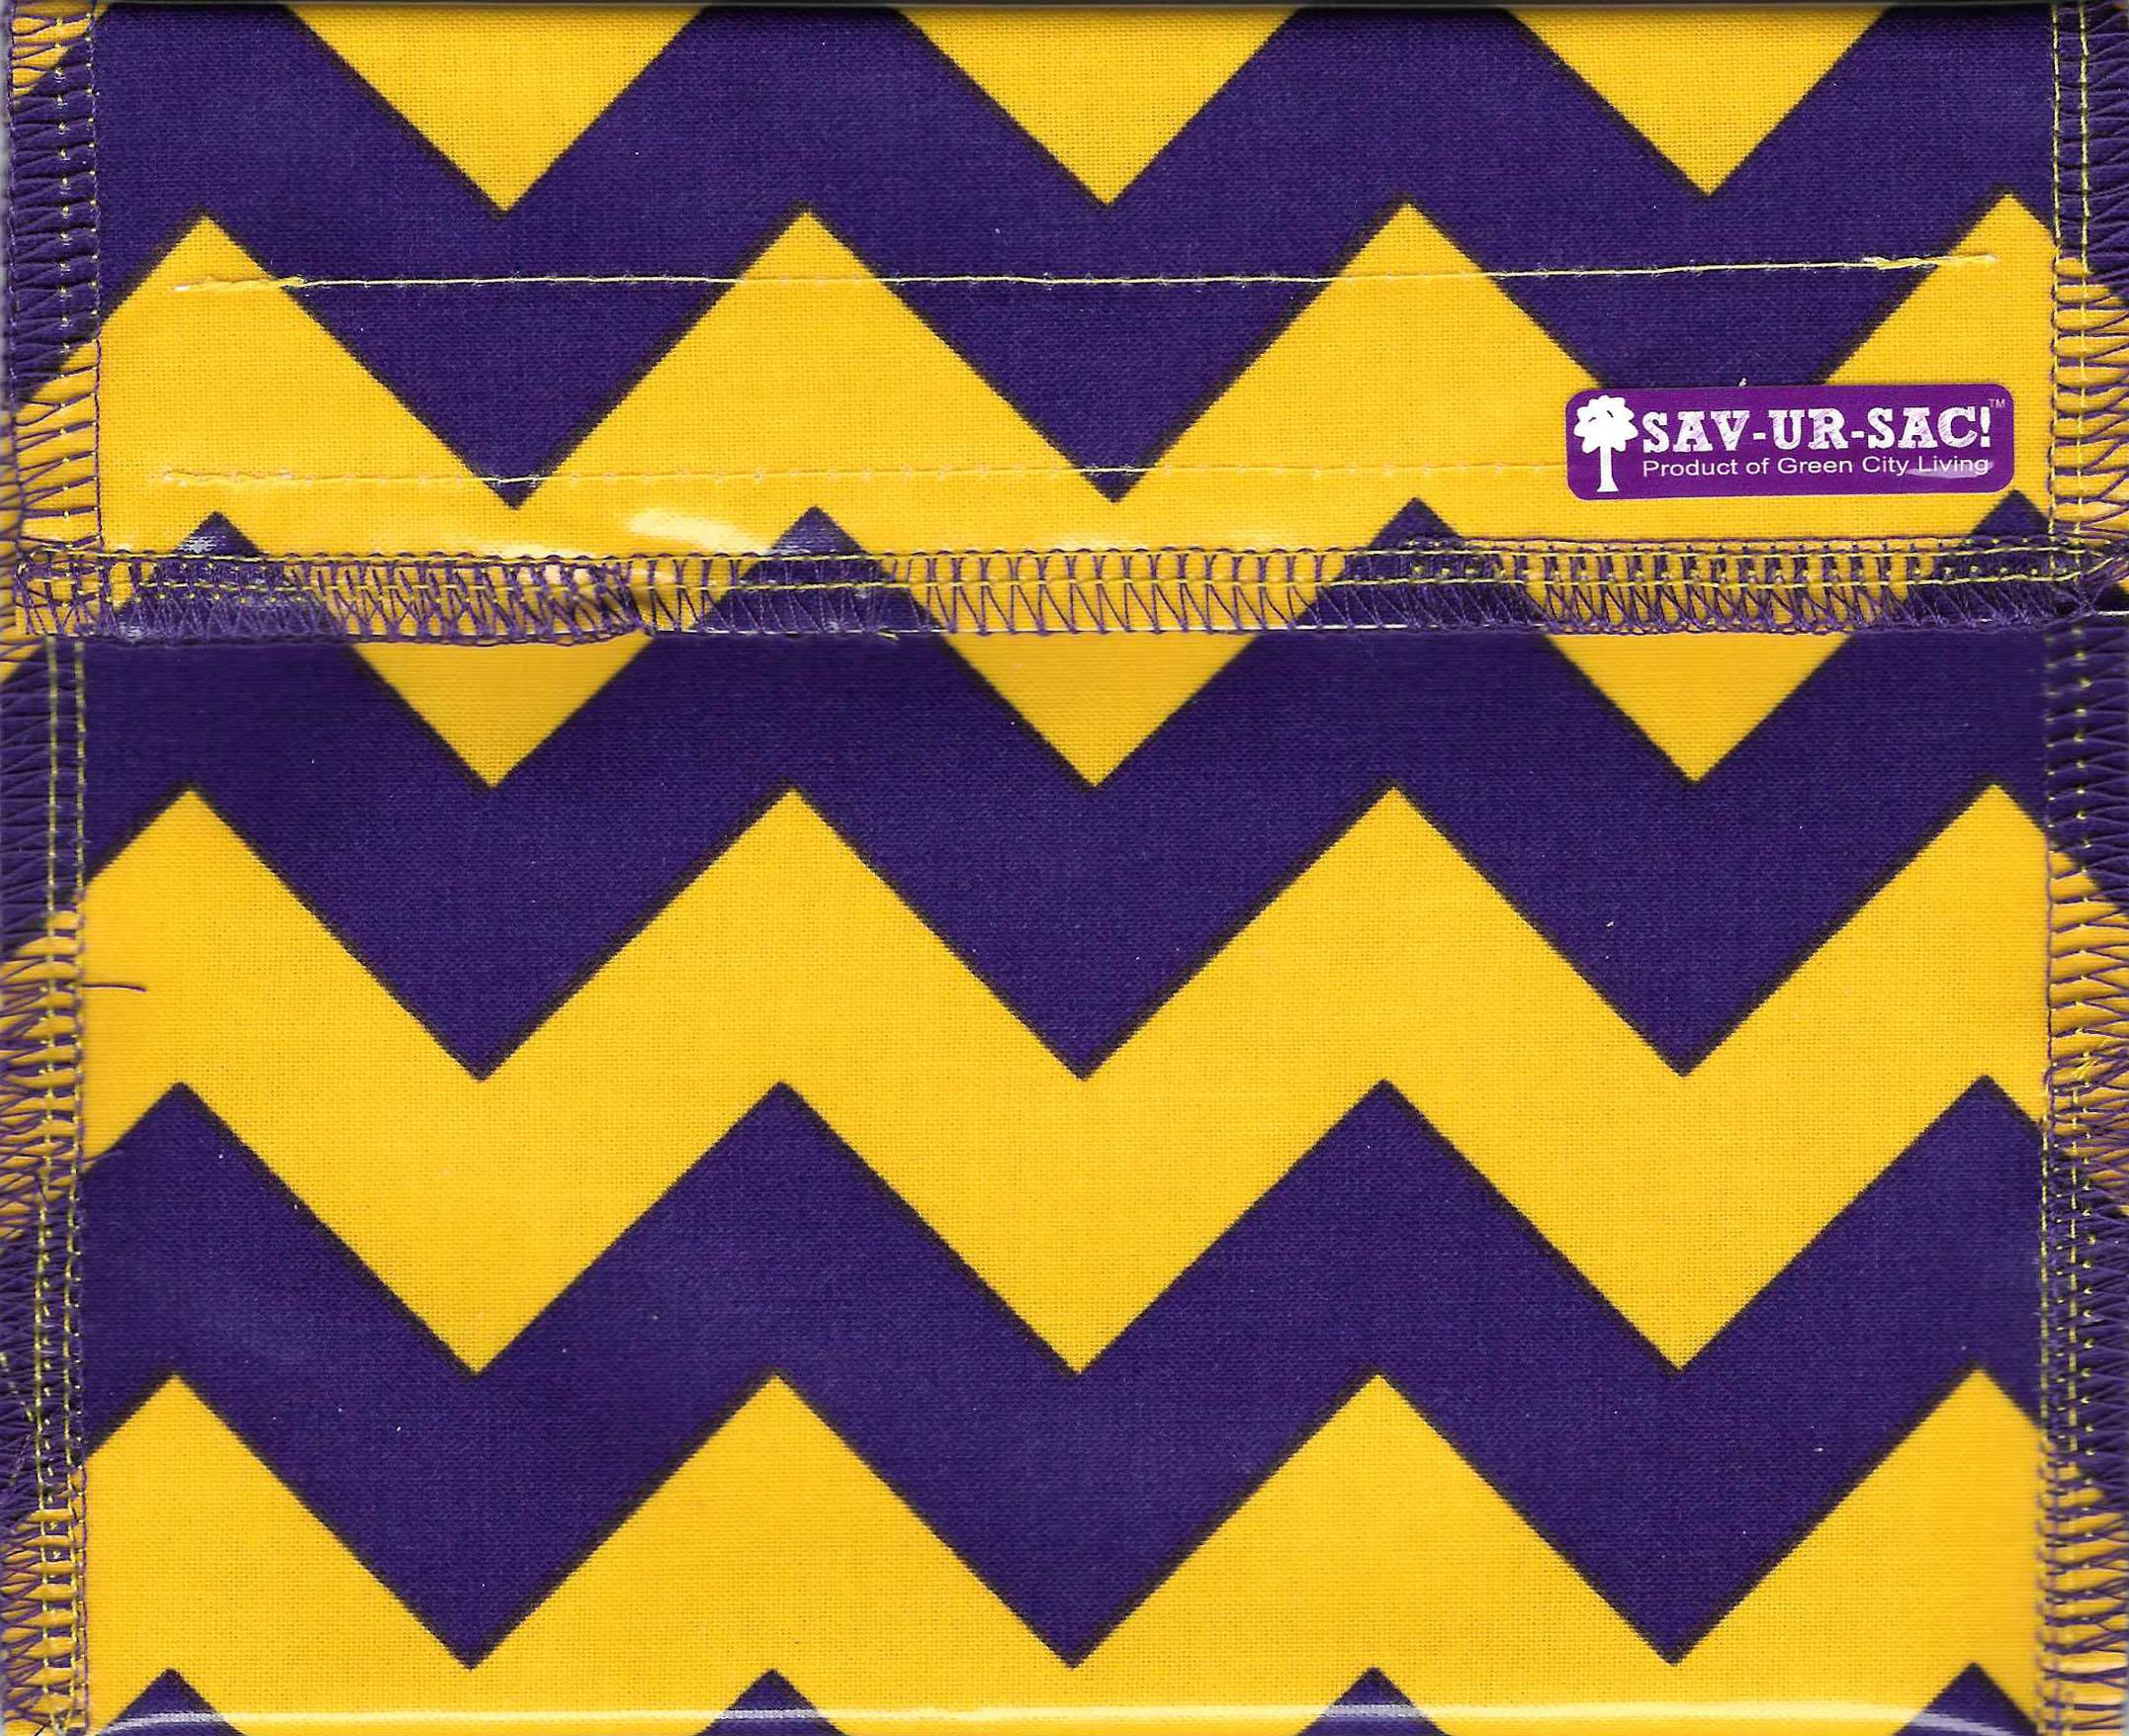 school colors gold purple.jpg